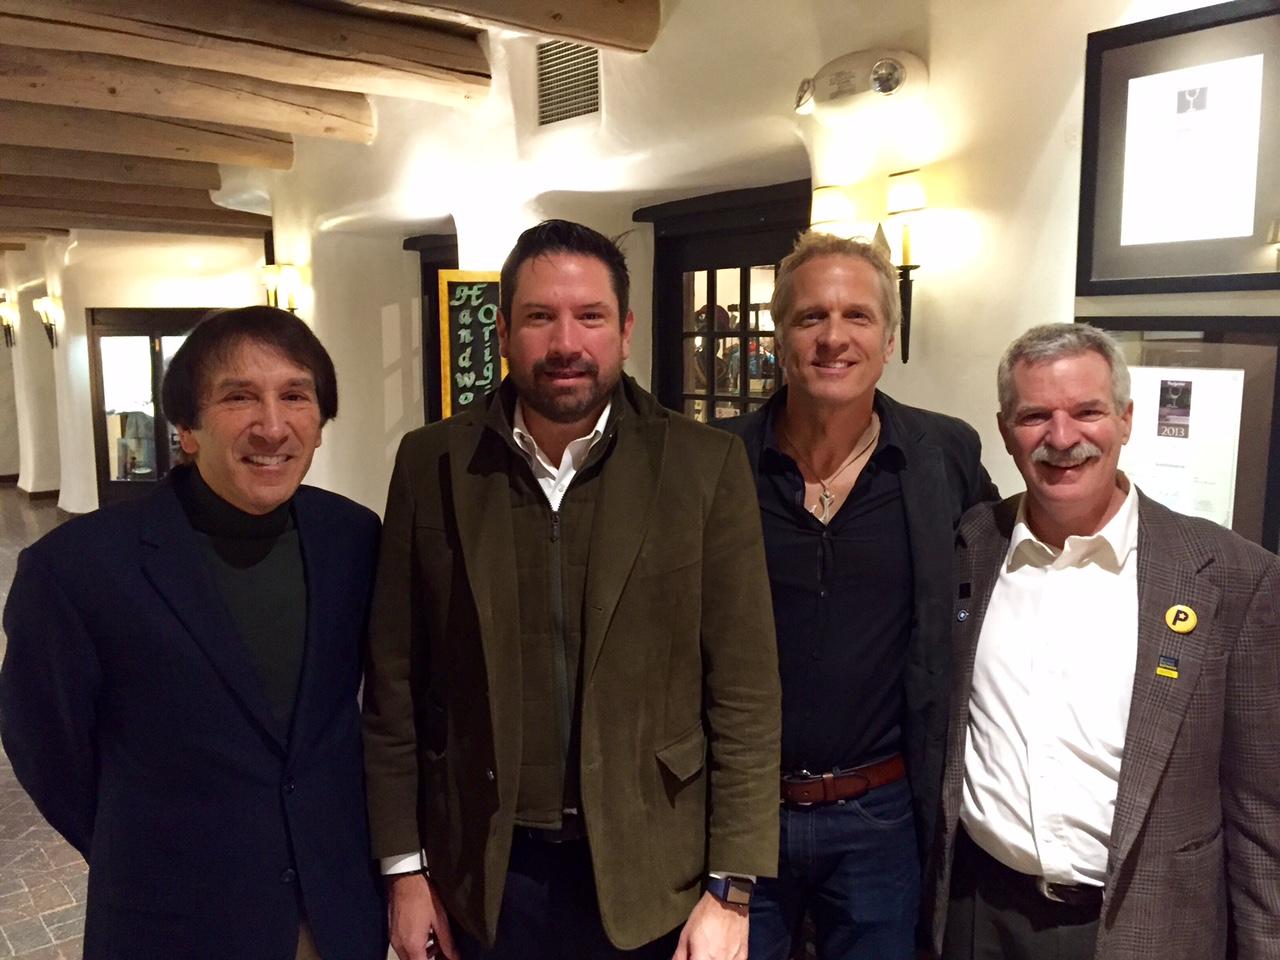 L-R: Mel MacKaron, Santa Fe Mayor Javier Gonzales, Patrick Fabian, Tom Schuch